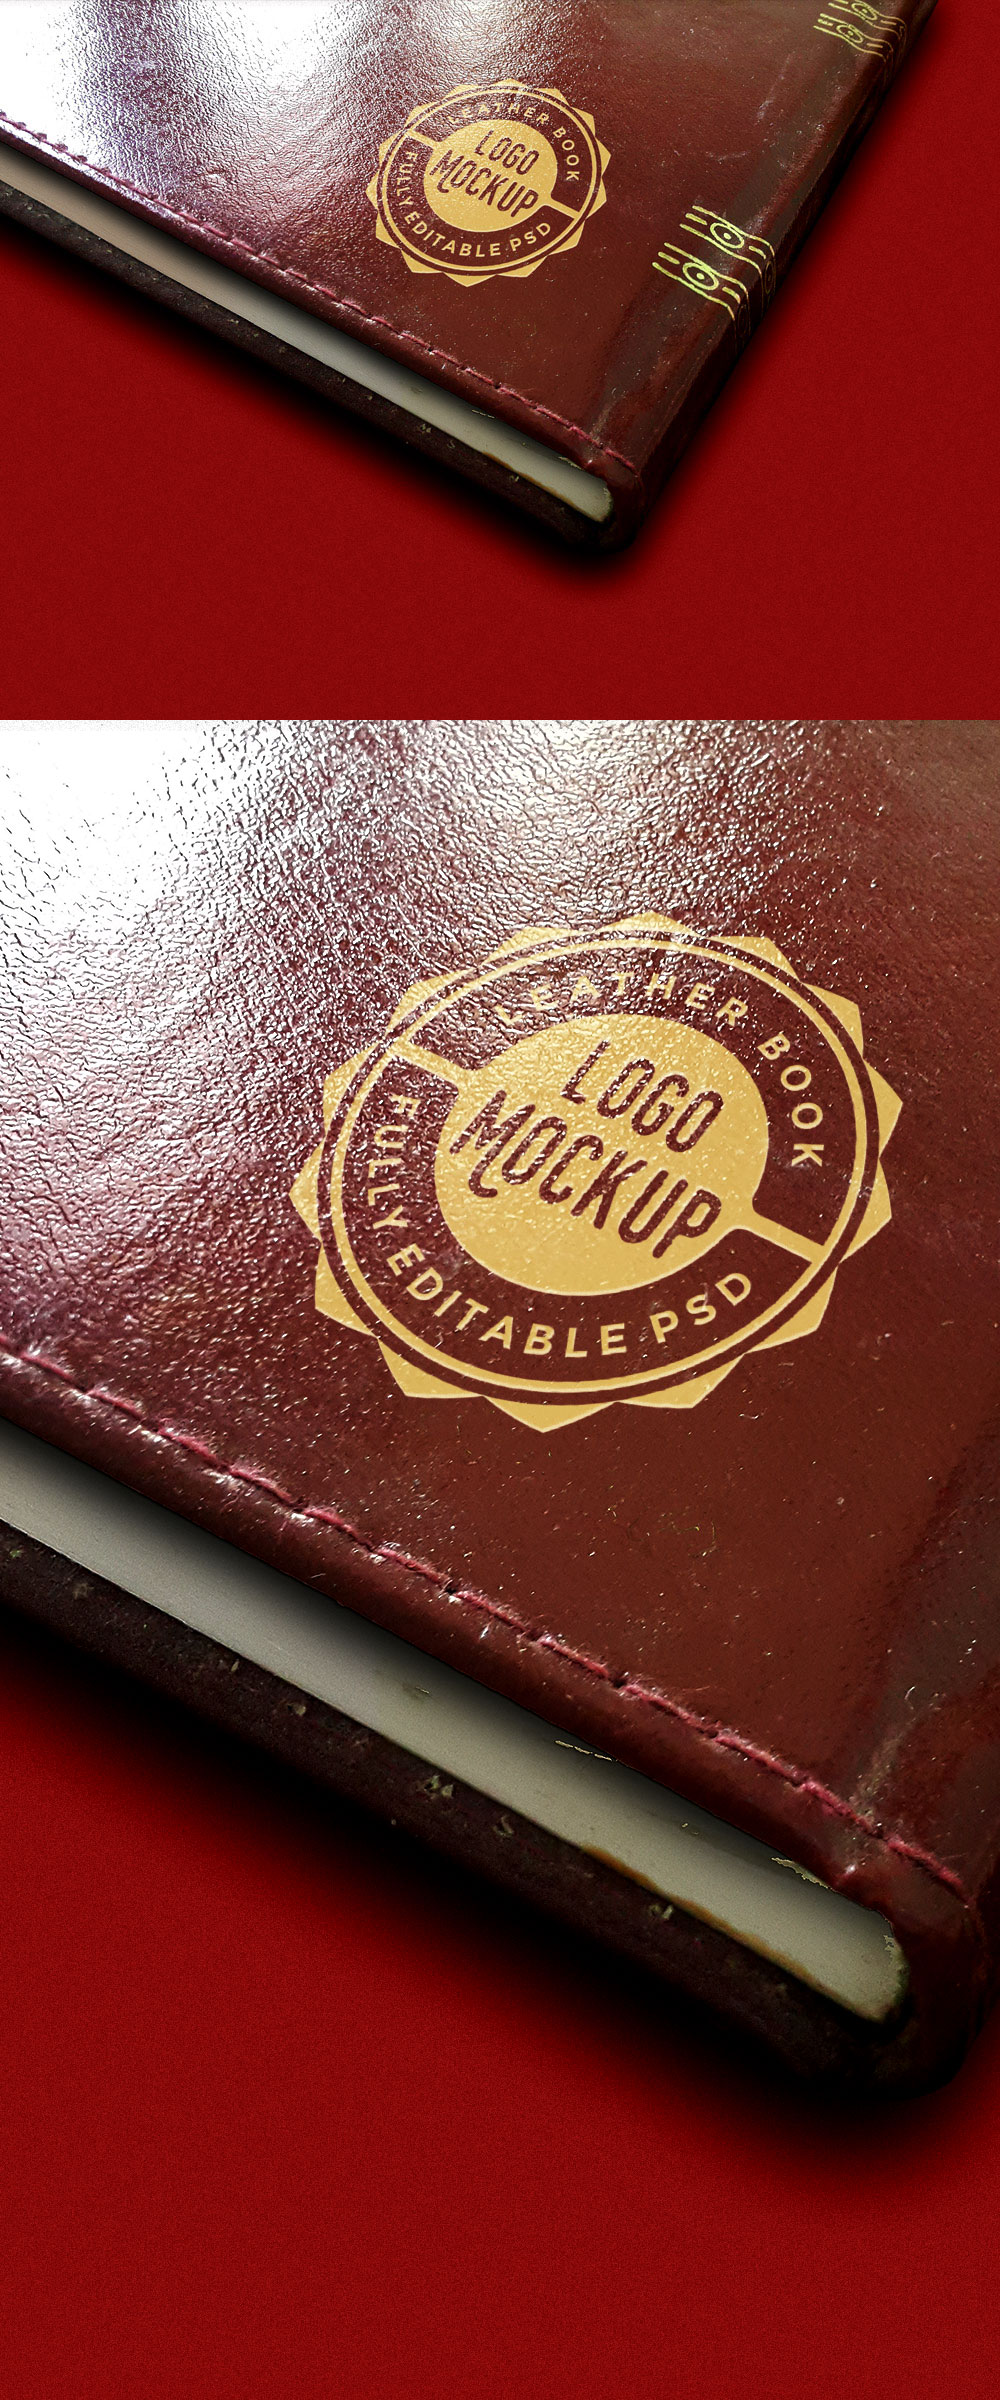 Vintage Leather Book